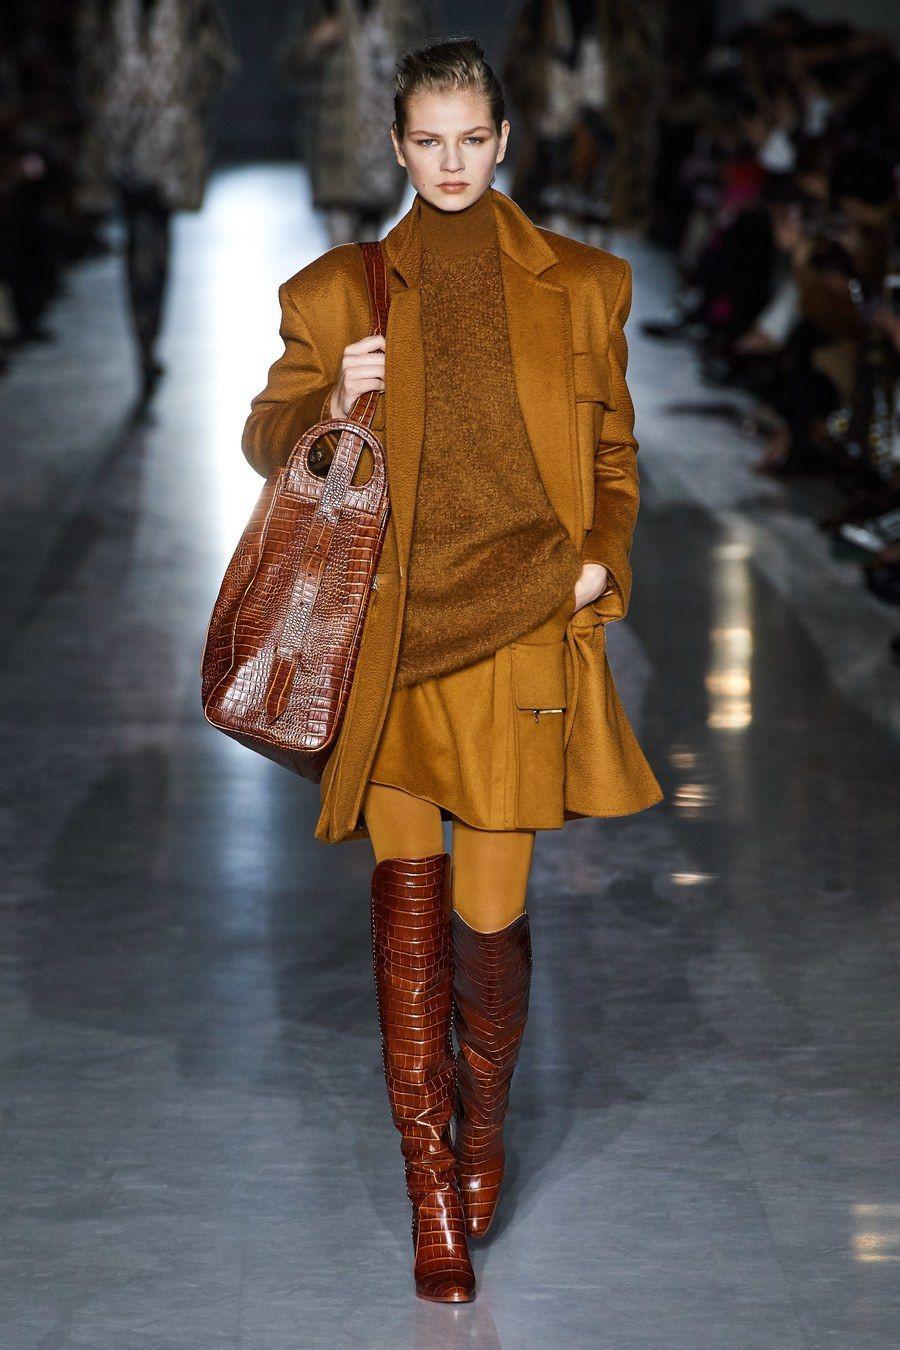 Colores otoño invierno 2020 milan fashion week, ready to wear